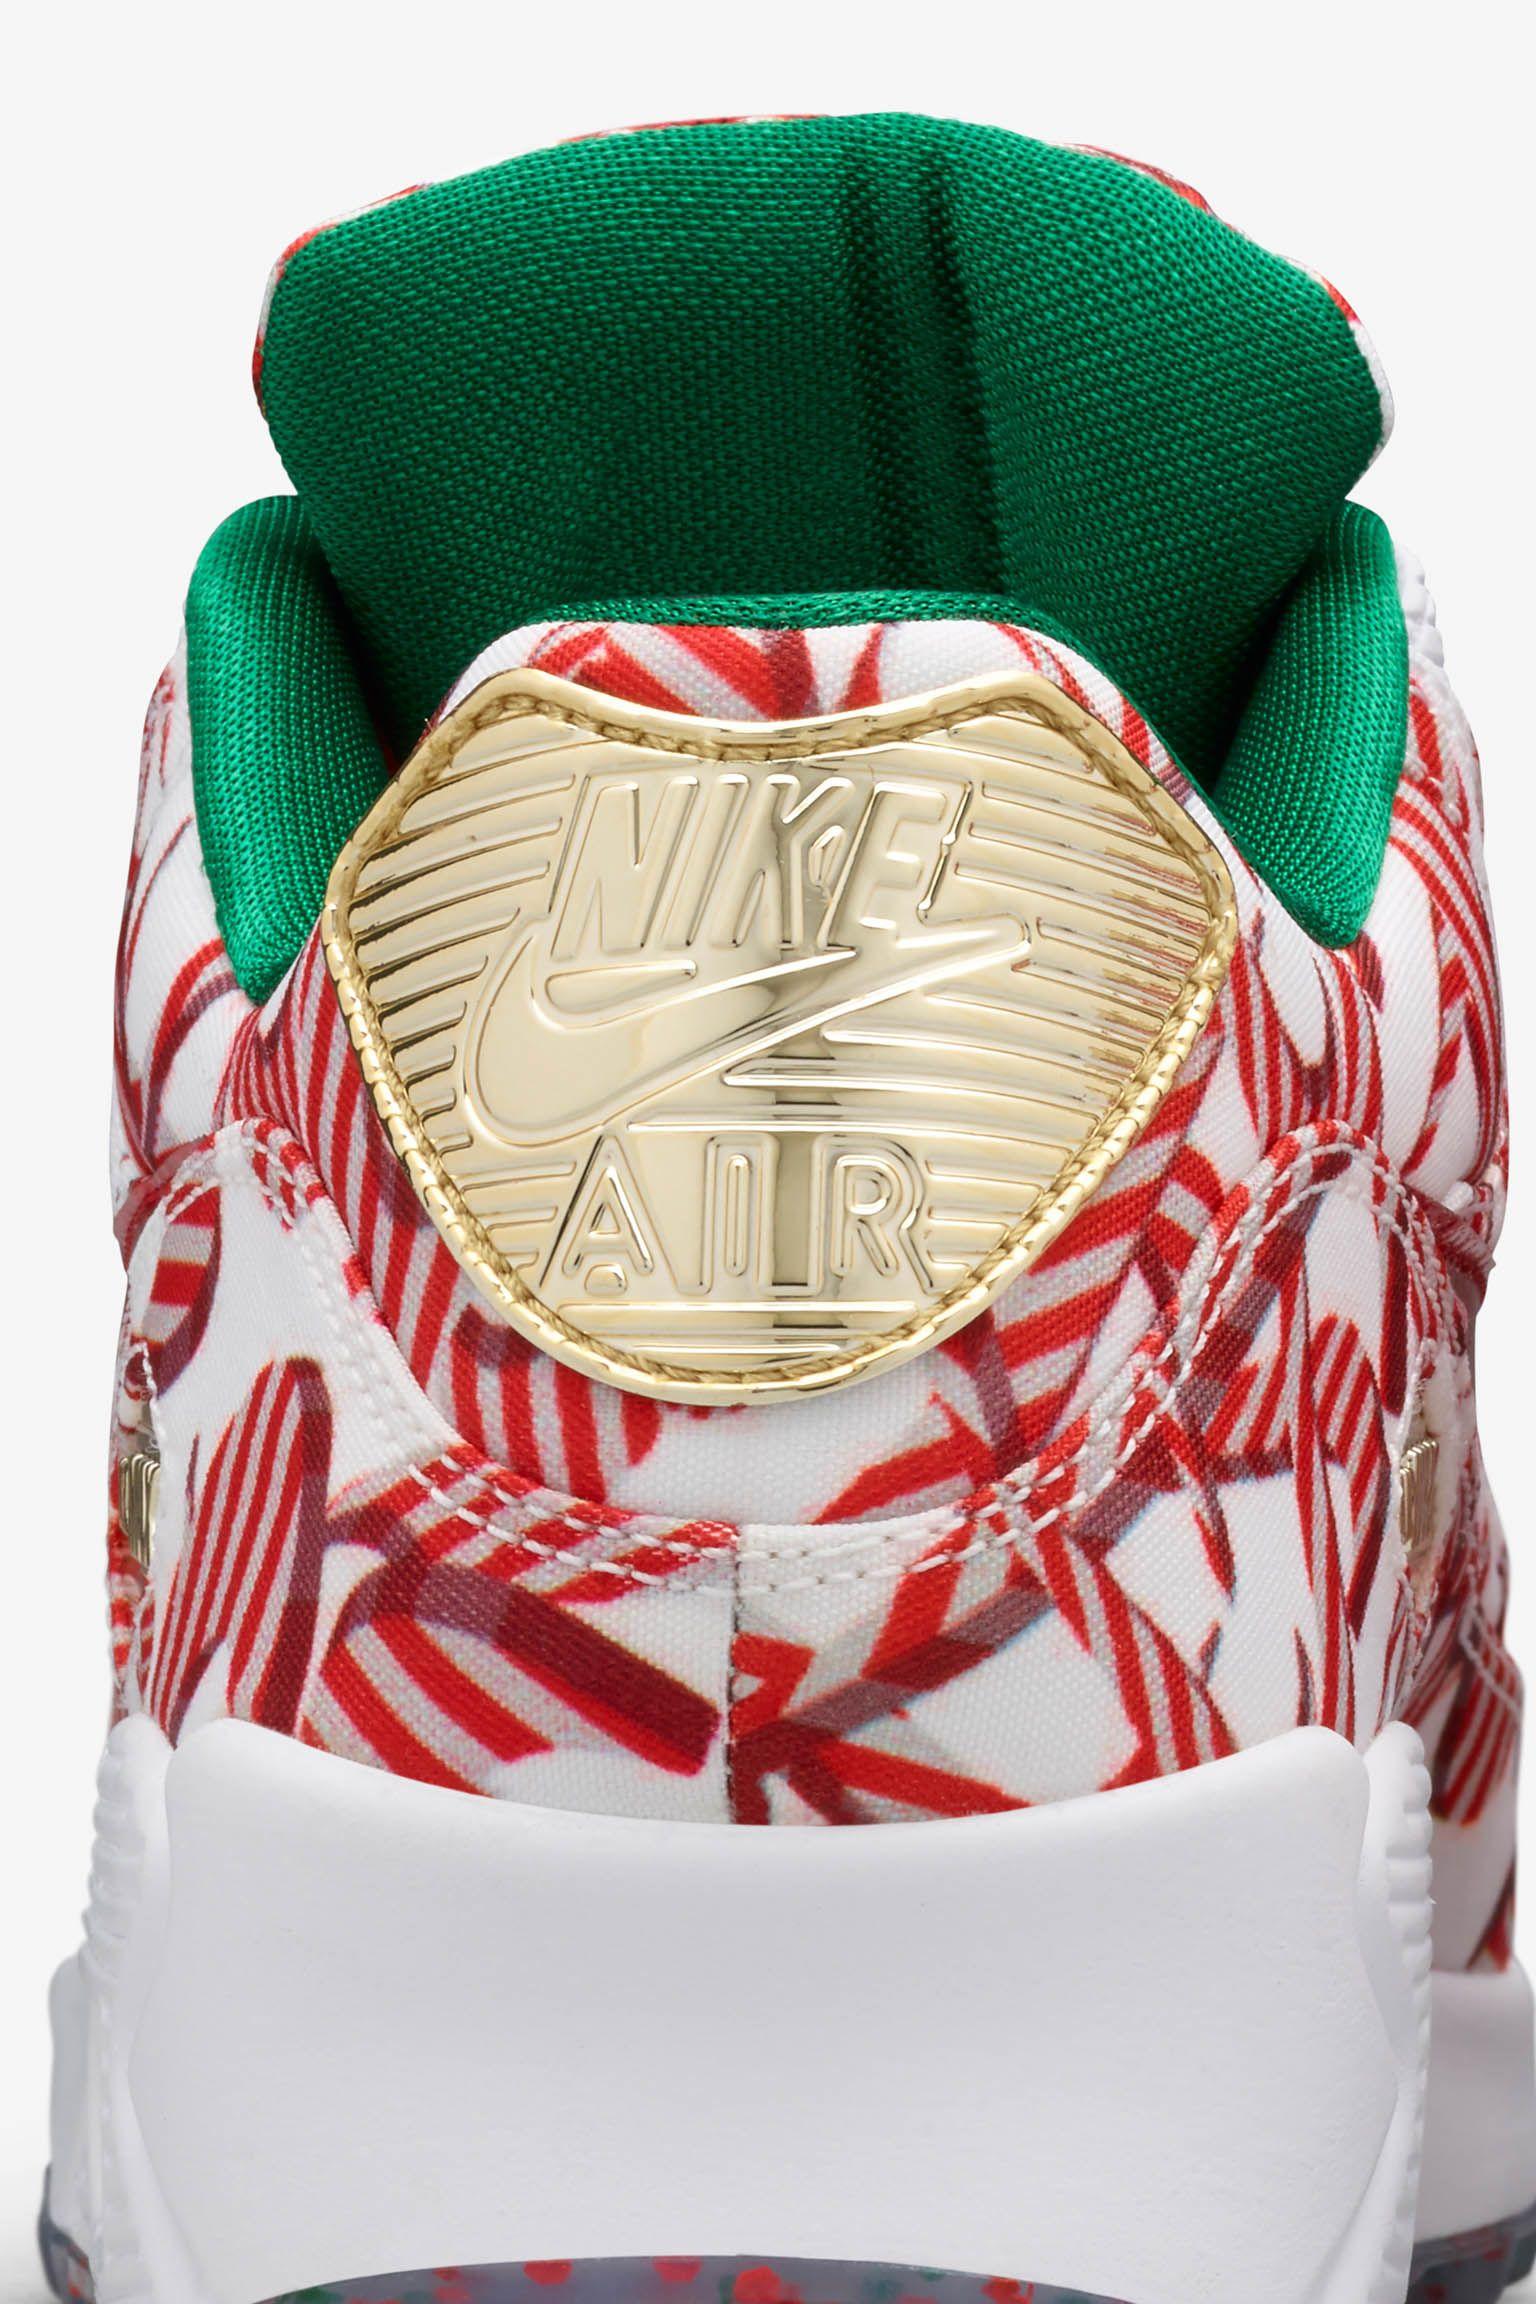 Women's Nike Blazer Mid 'Gift Wrapped'